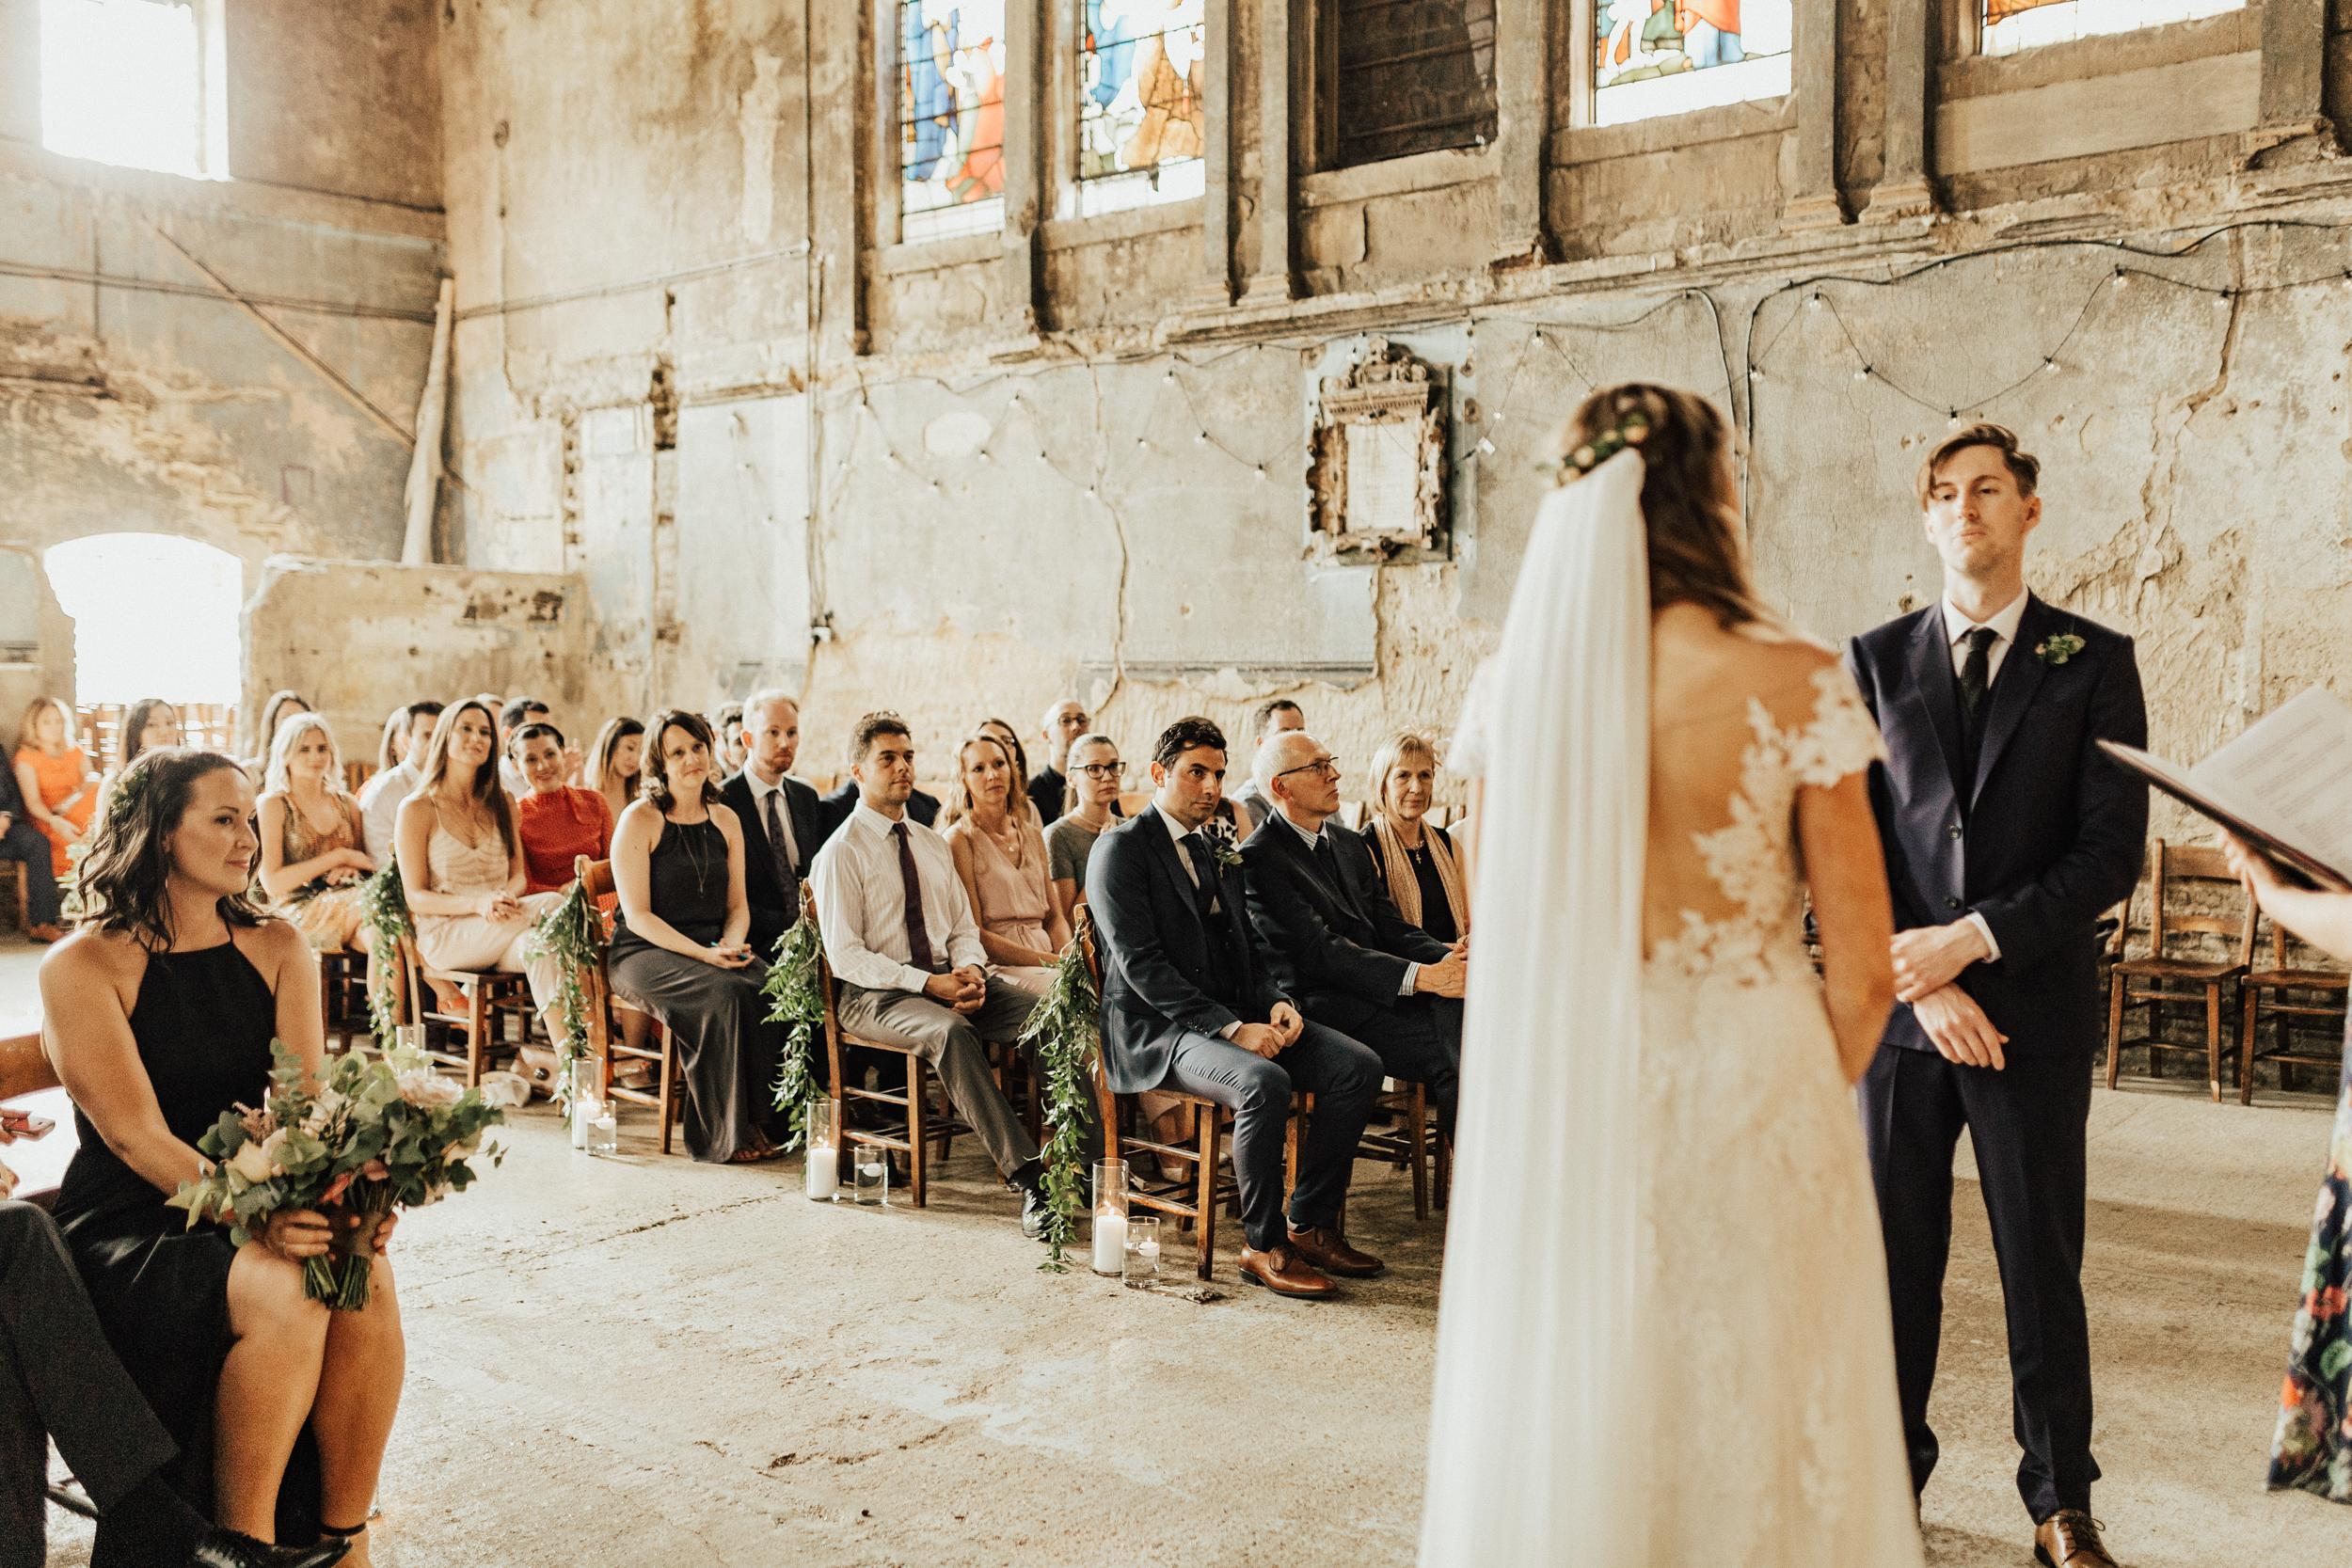 Laura-Benn-The-Asylum-London-The-Ace-Hotel-Wedding-Alternative-Darina-Stoda-Photography-171.jpg